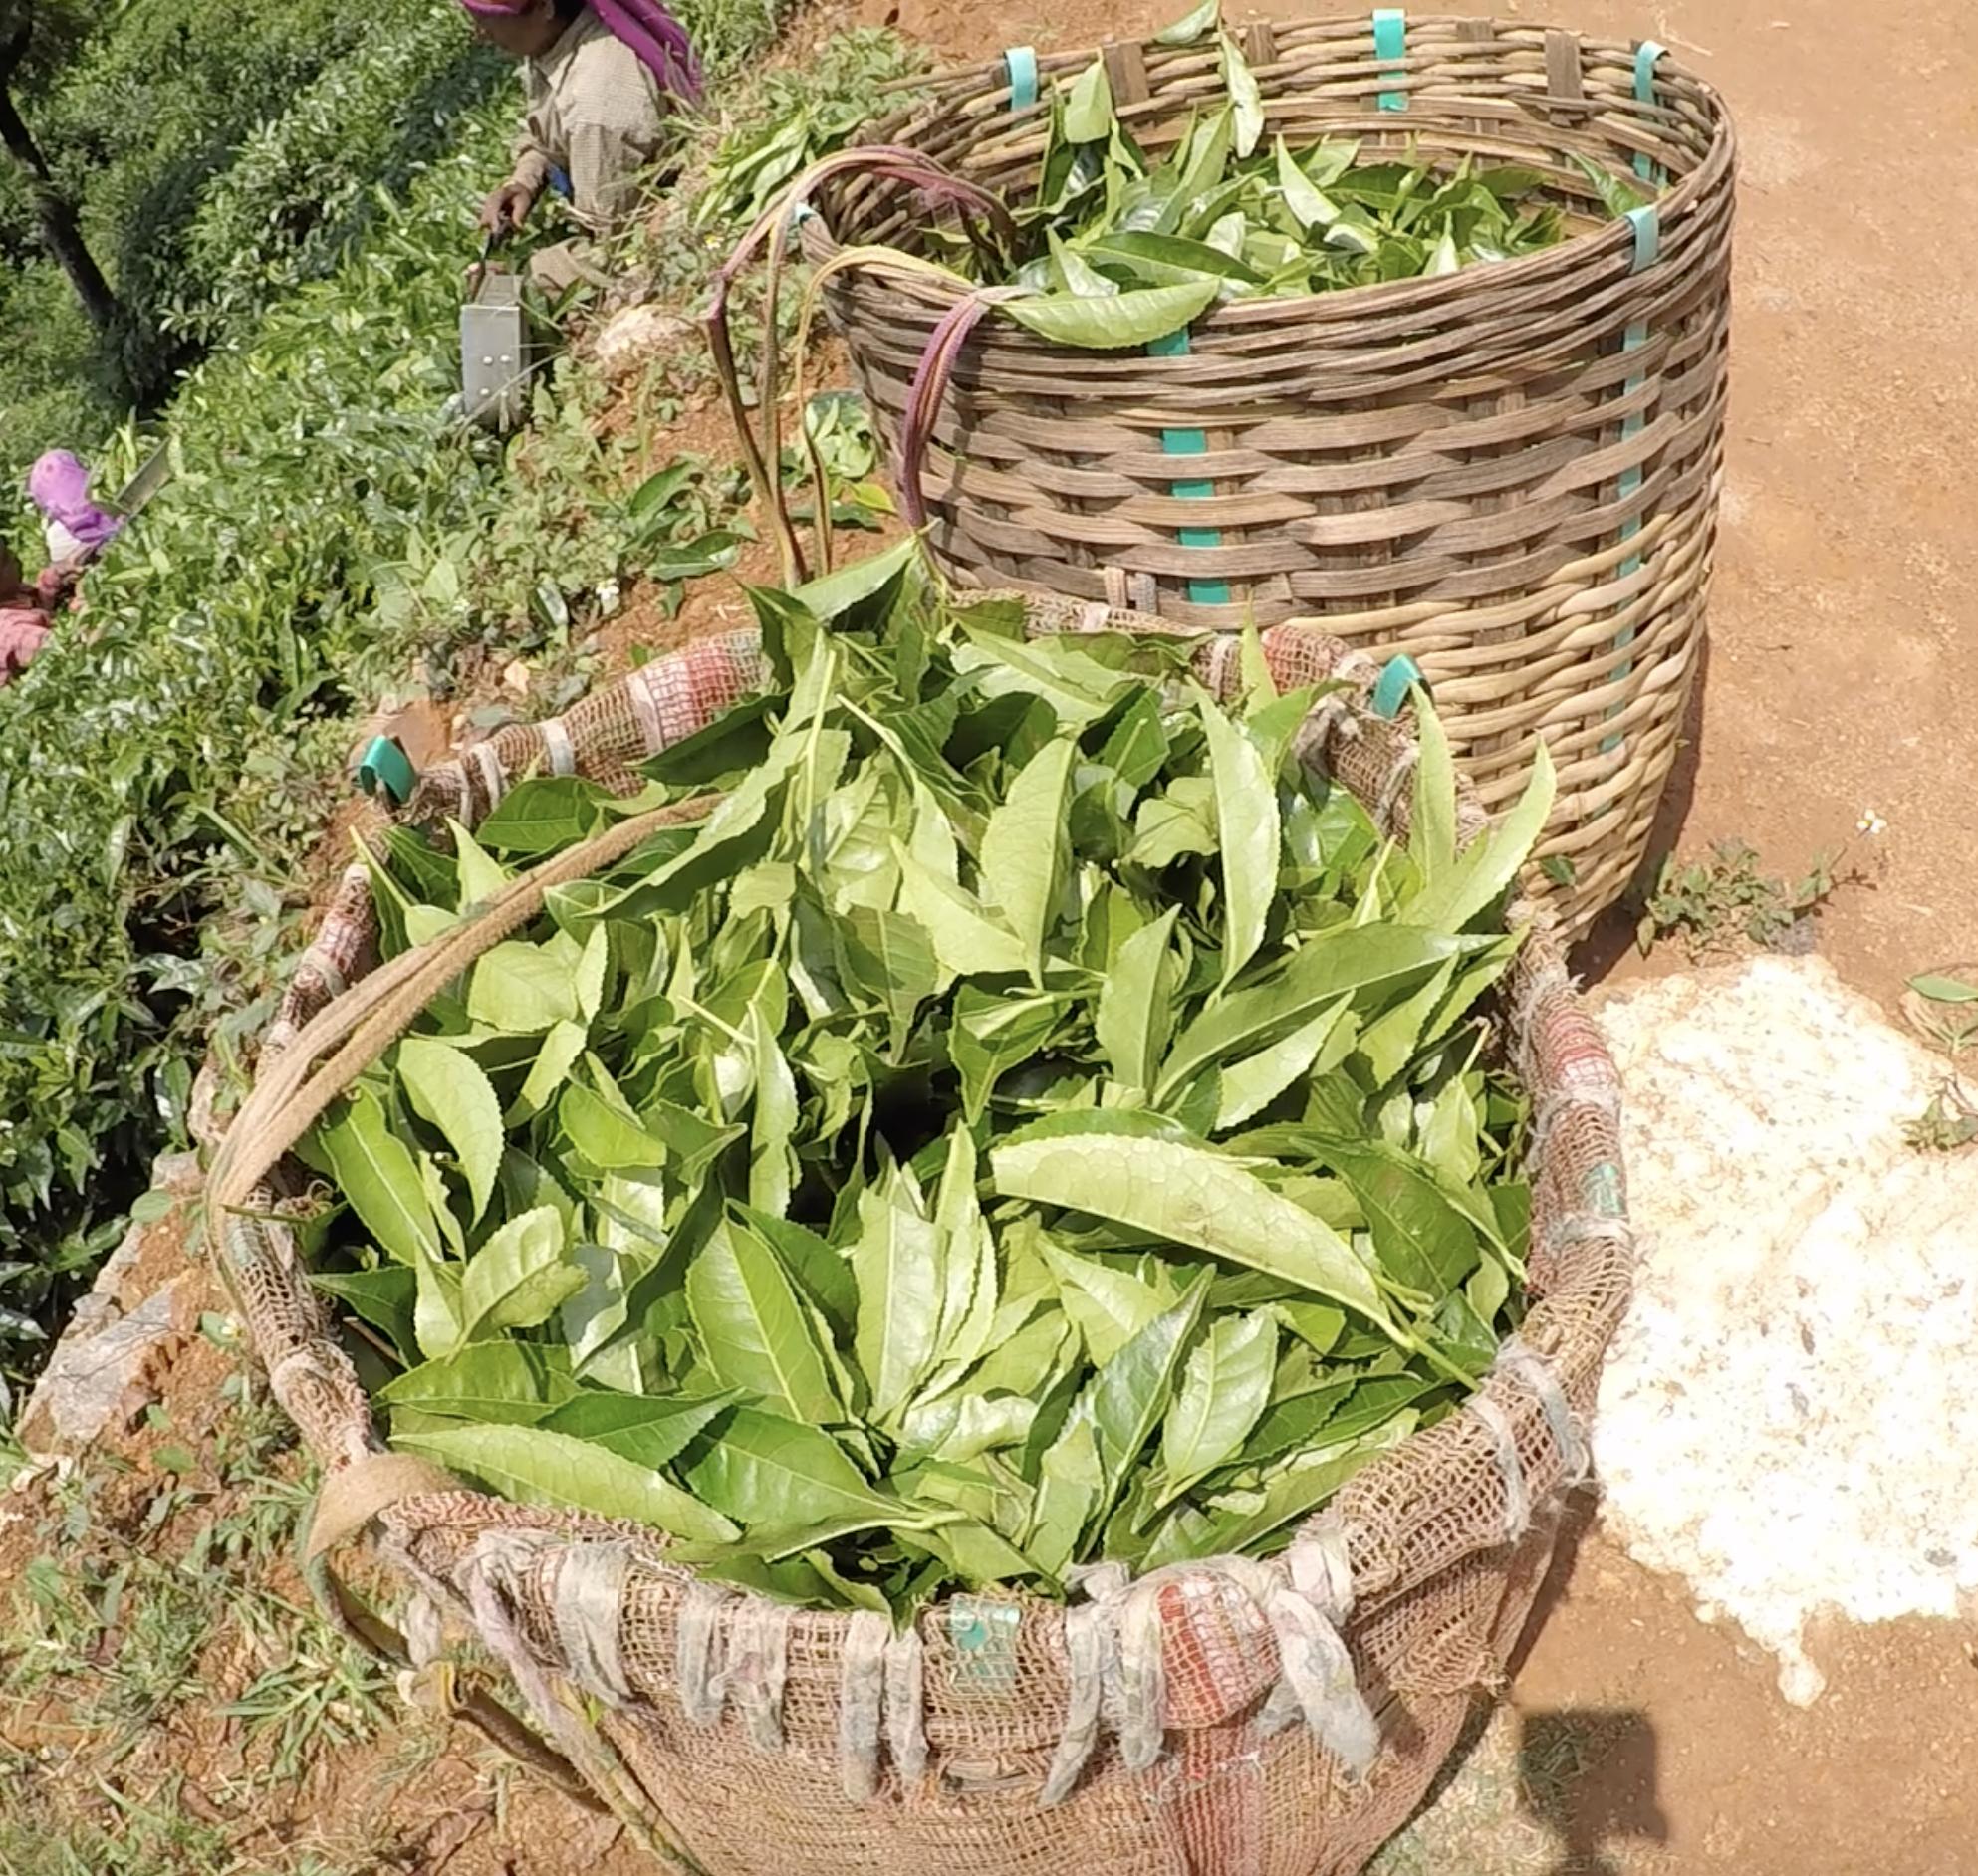 Harvested green tea leaves. © Applied Food Sciences, Inc.